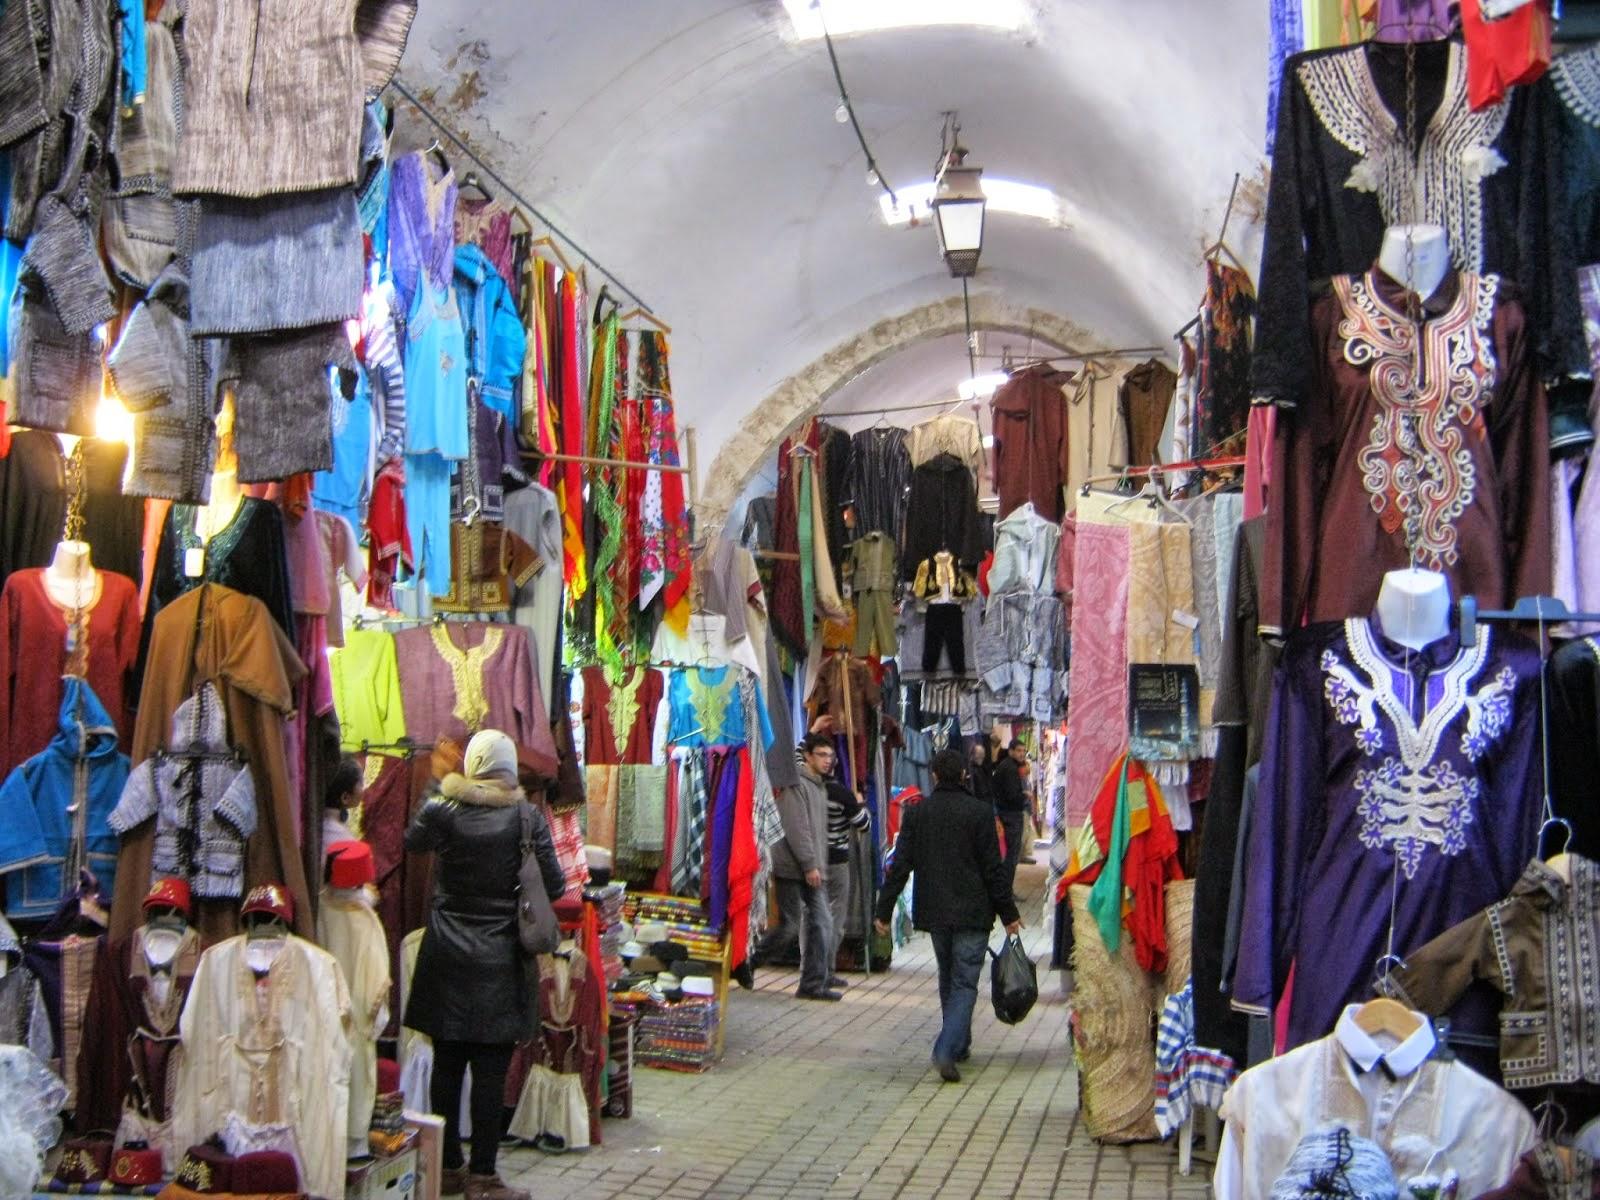 Grosir Murah di Surabaya Grosiran Baju Murah di Surabaya sebagai Pilihan Belanja